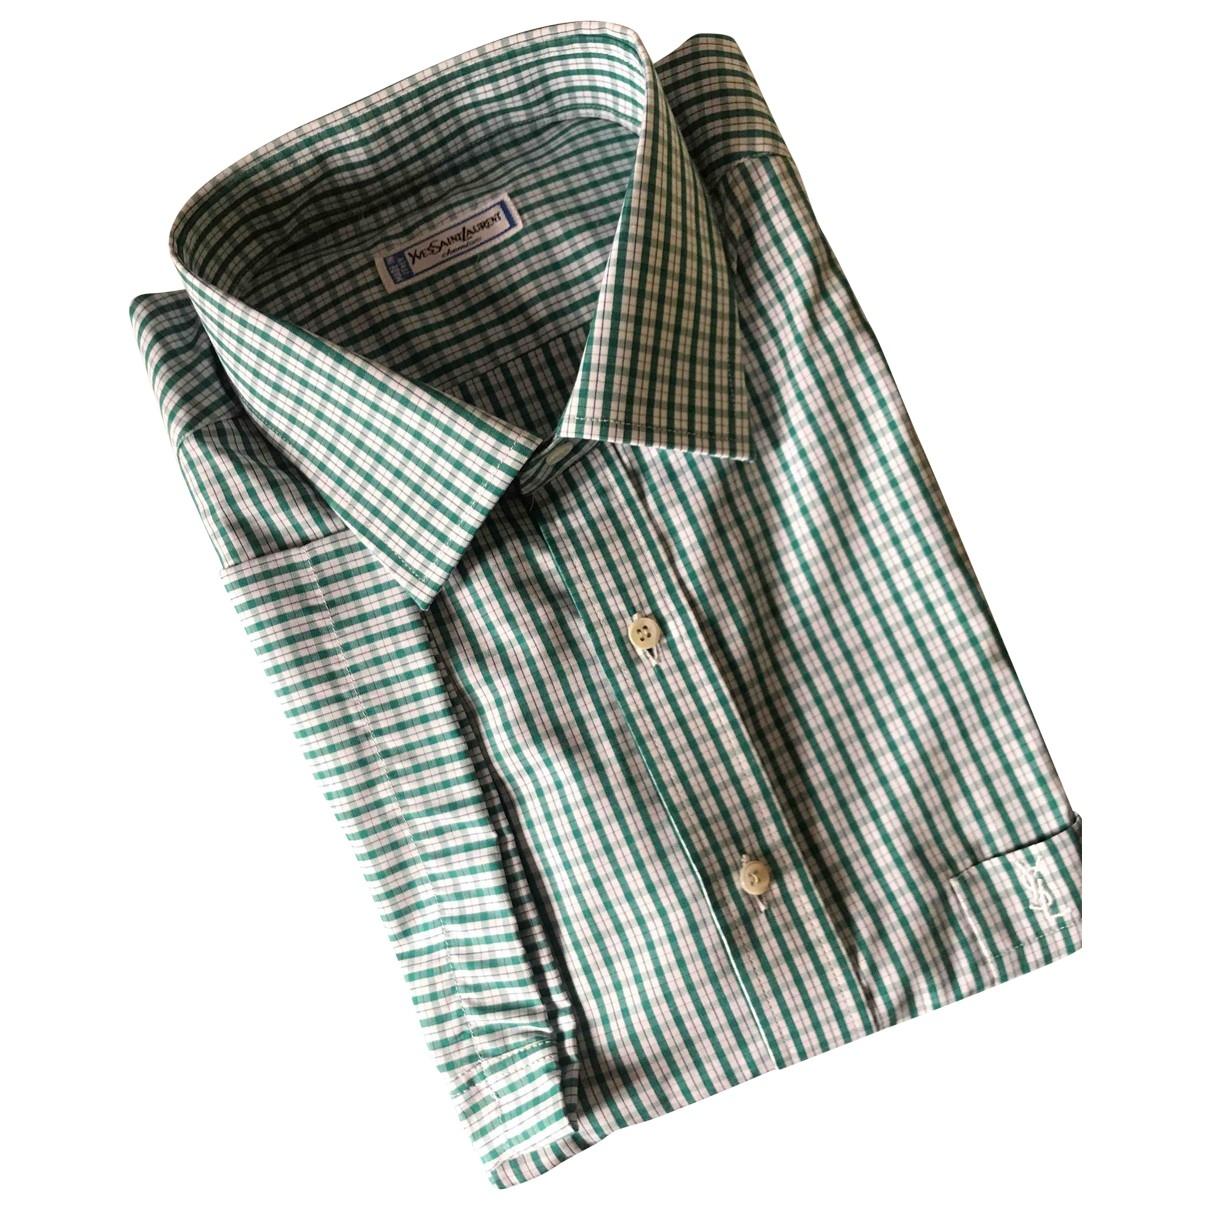 Yves Saint Laurent \N Green Cotton Shirts for Men 43 EU (tour de cou / collar)